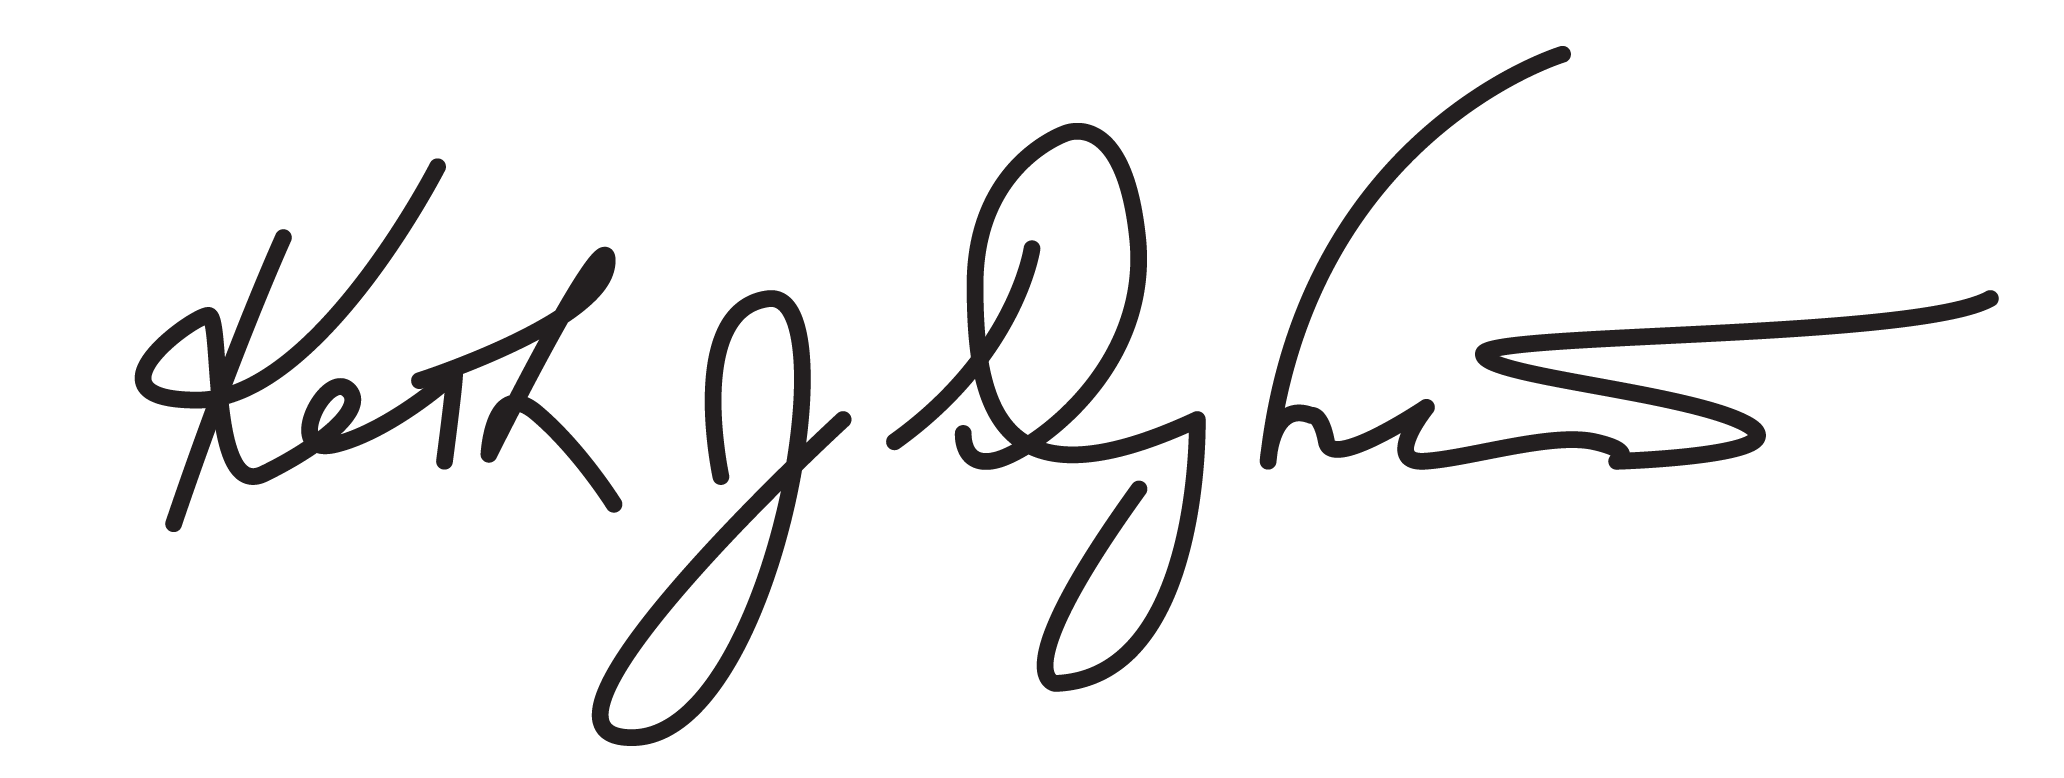 Keith Signature